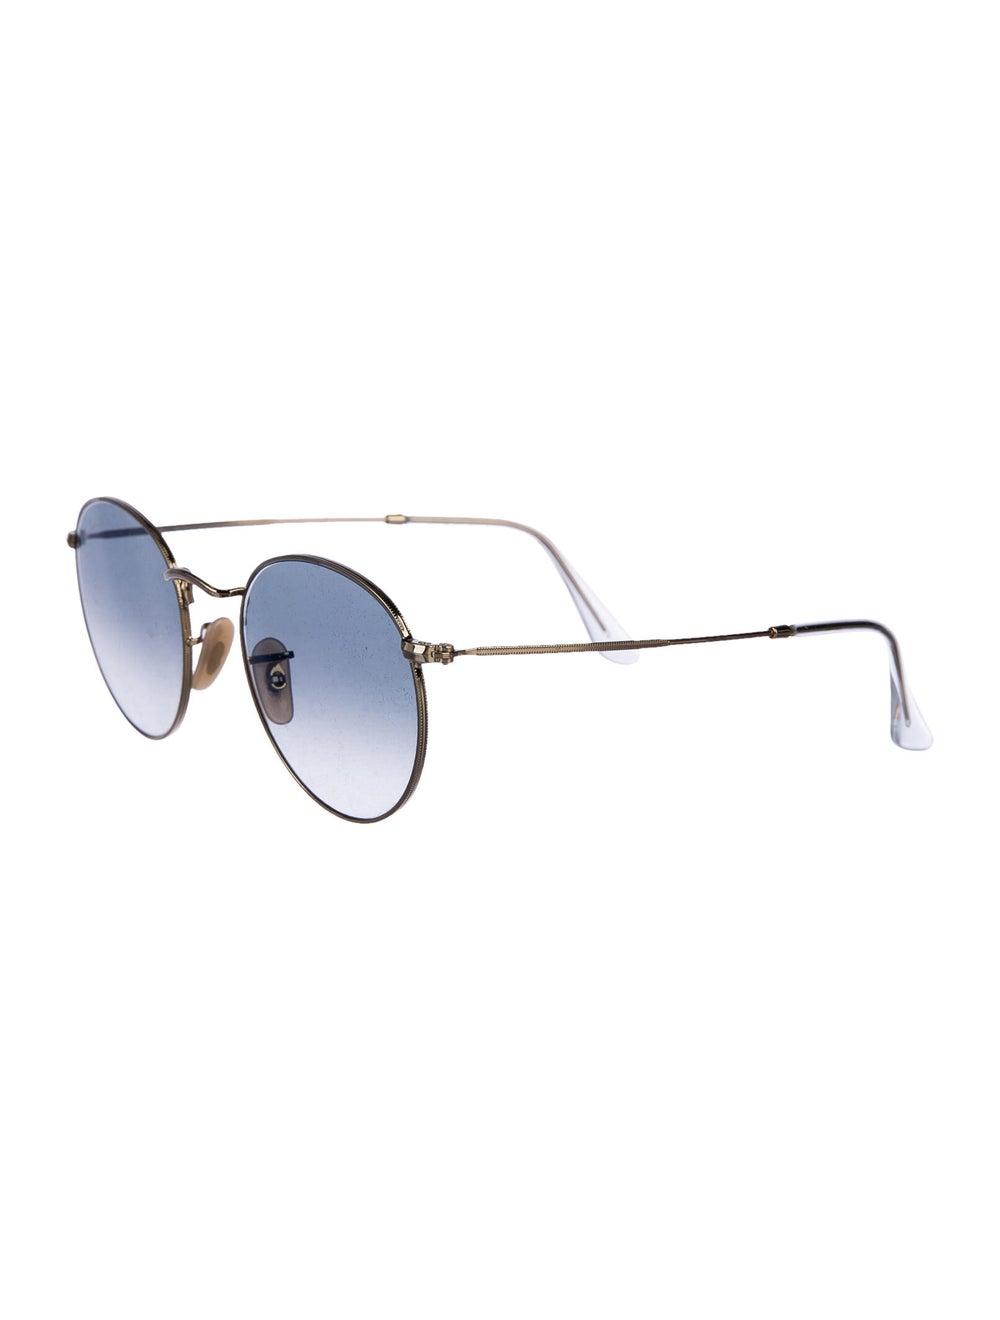 Ray-Ban Round Metal Round Sunglasses Gold - image 2